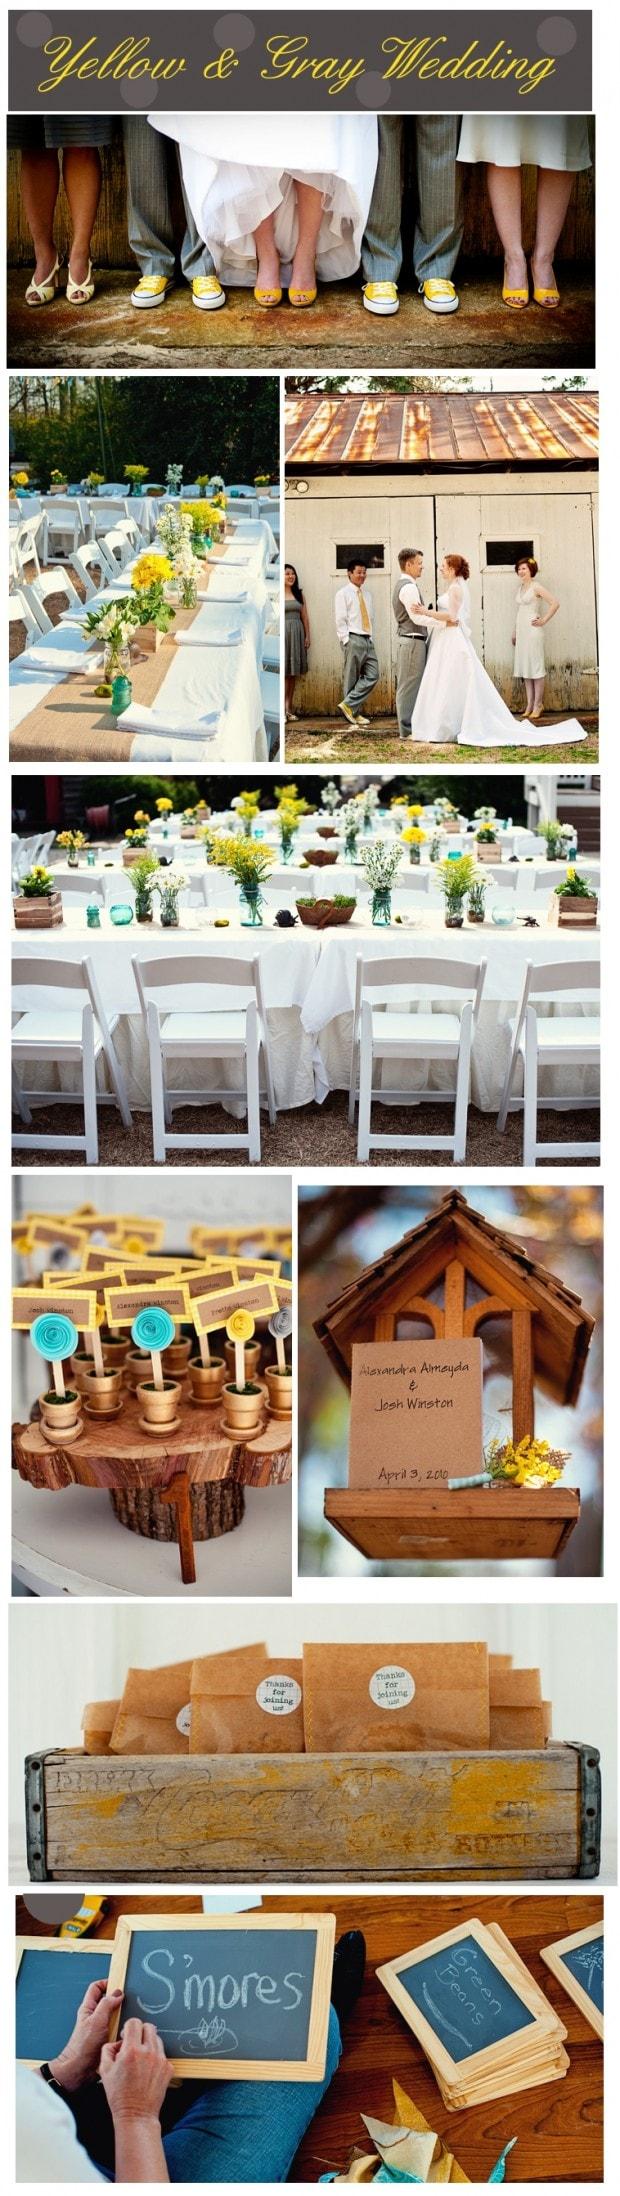 Yellow & Gray Wedding